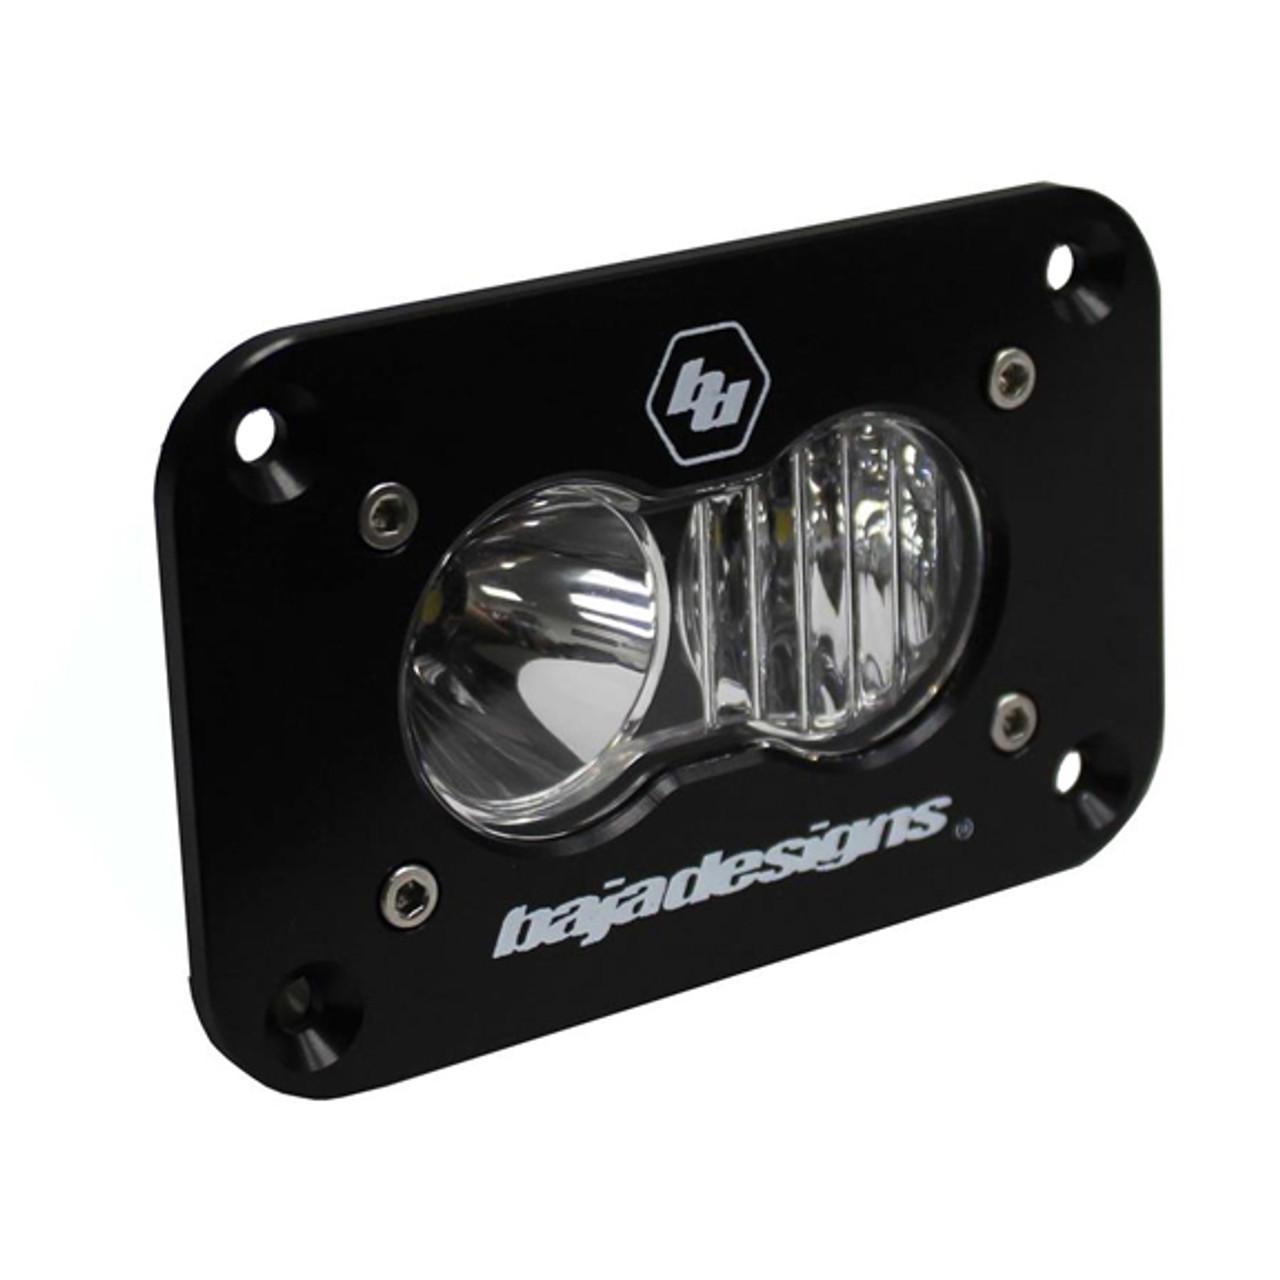 baja designs s2 sport flush mount led driving combo 4x4truckleds com